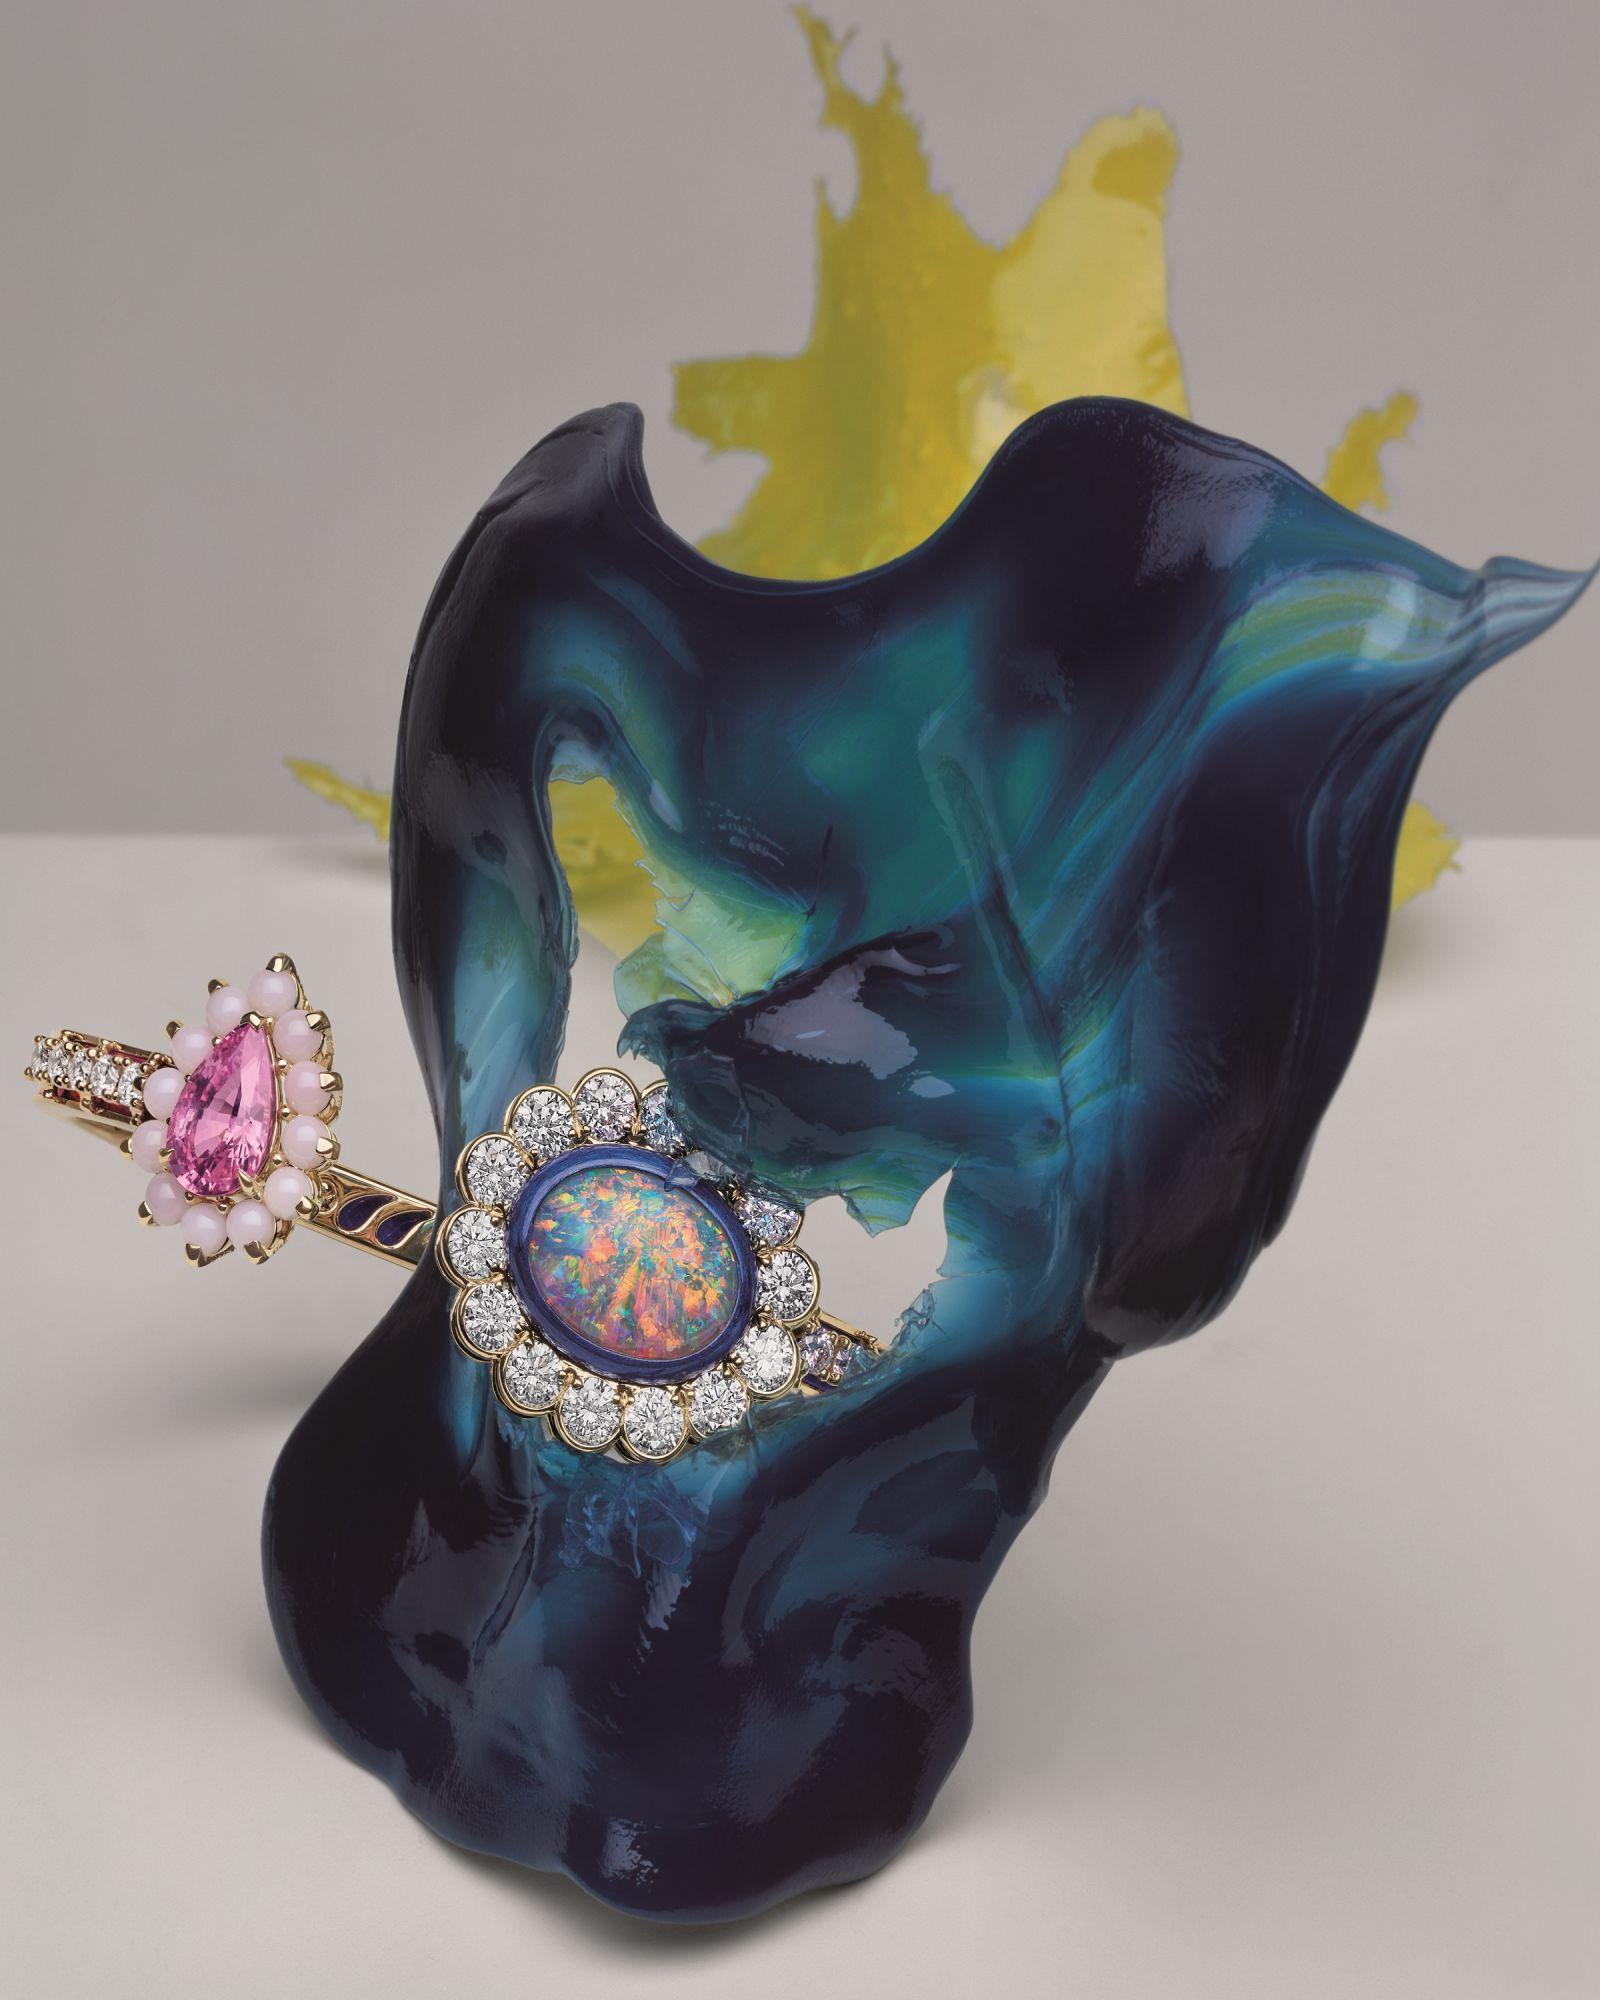 Dior Presents New Haute Joaillerie Collection, Dior Et Moi—A Romantic Revival